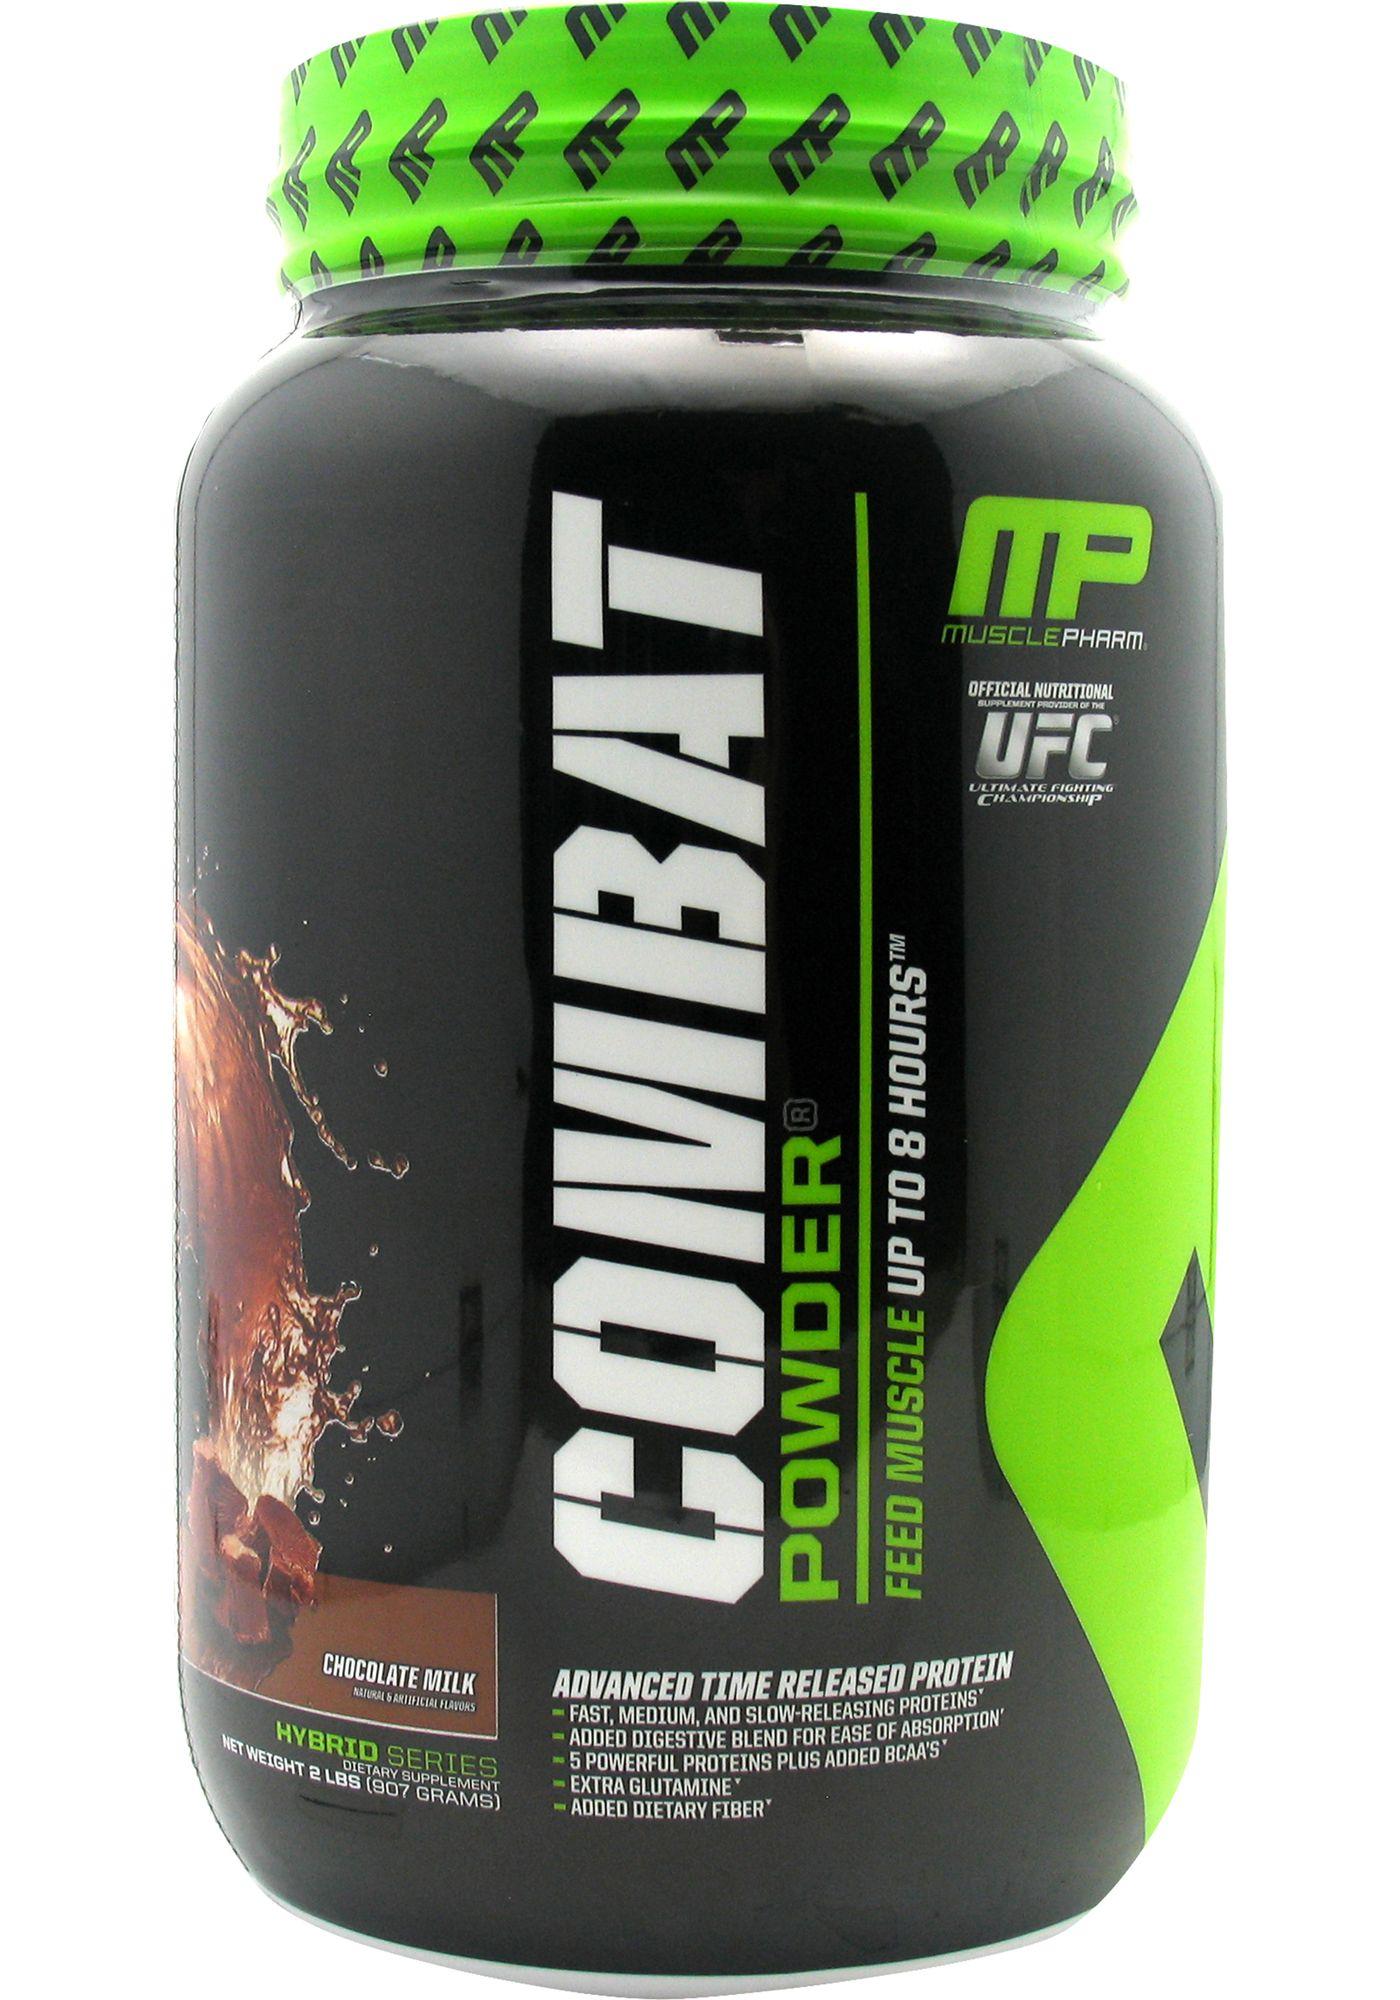 Muscle Pharm Combat Protein Powder Chocolate Milk 2 lbs